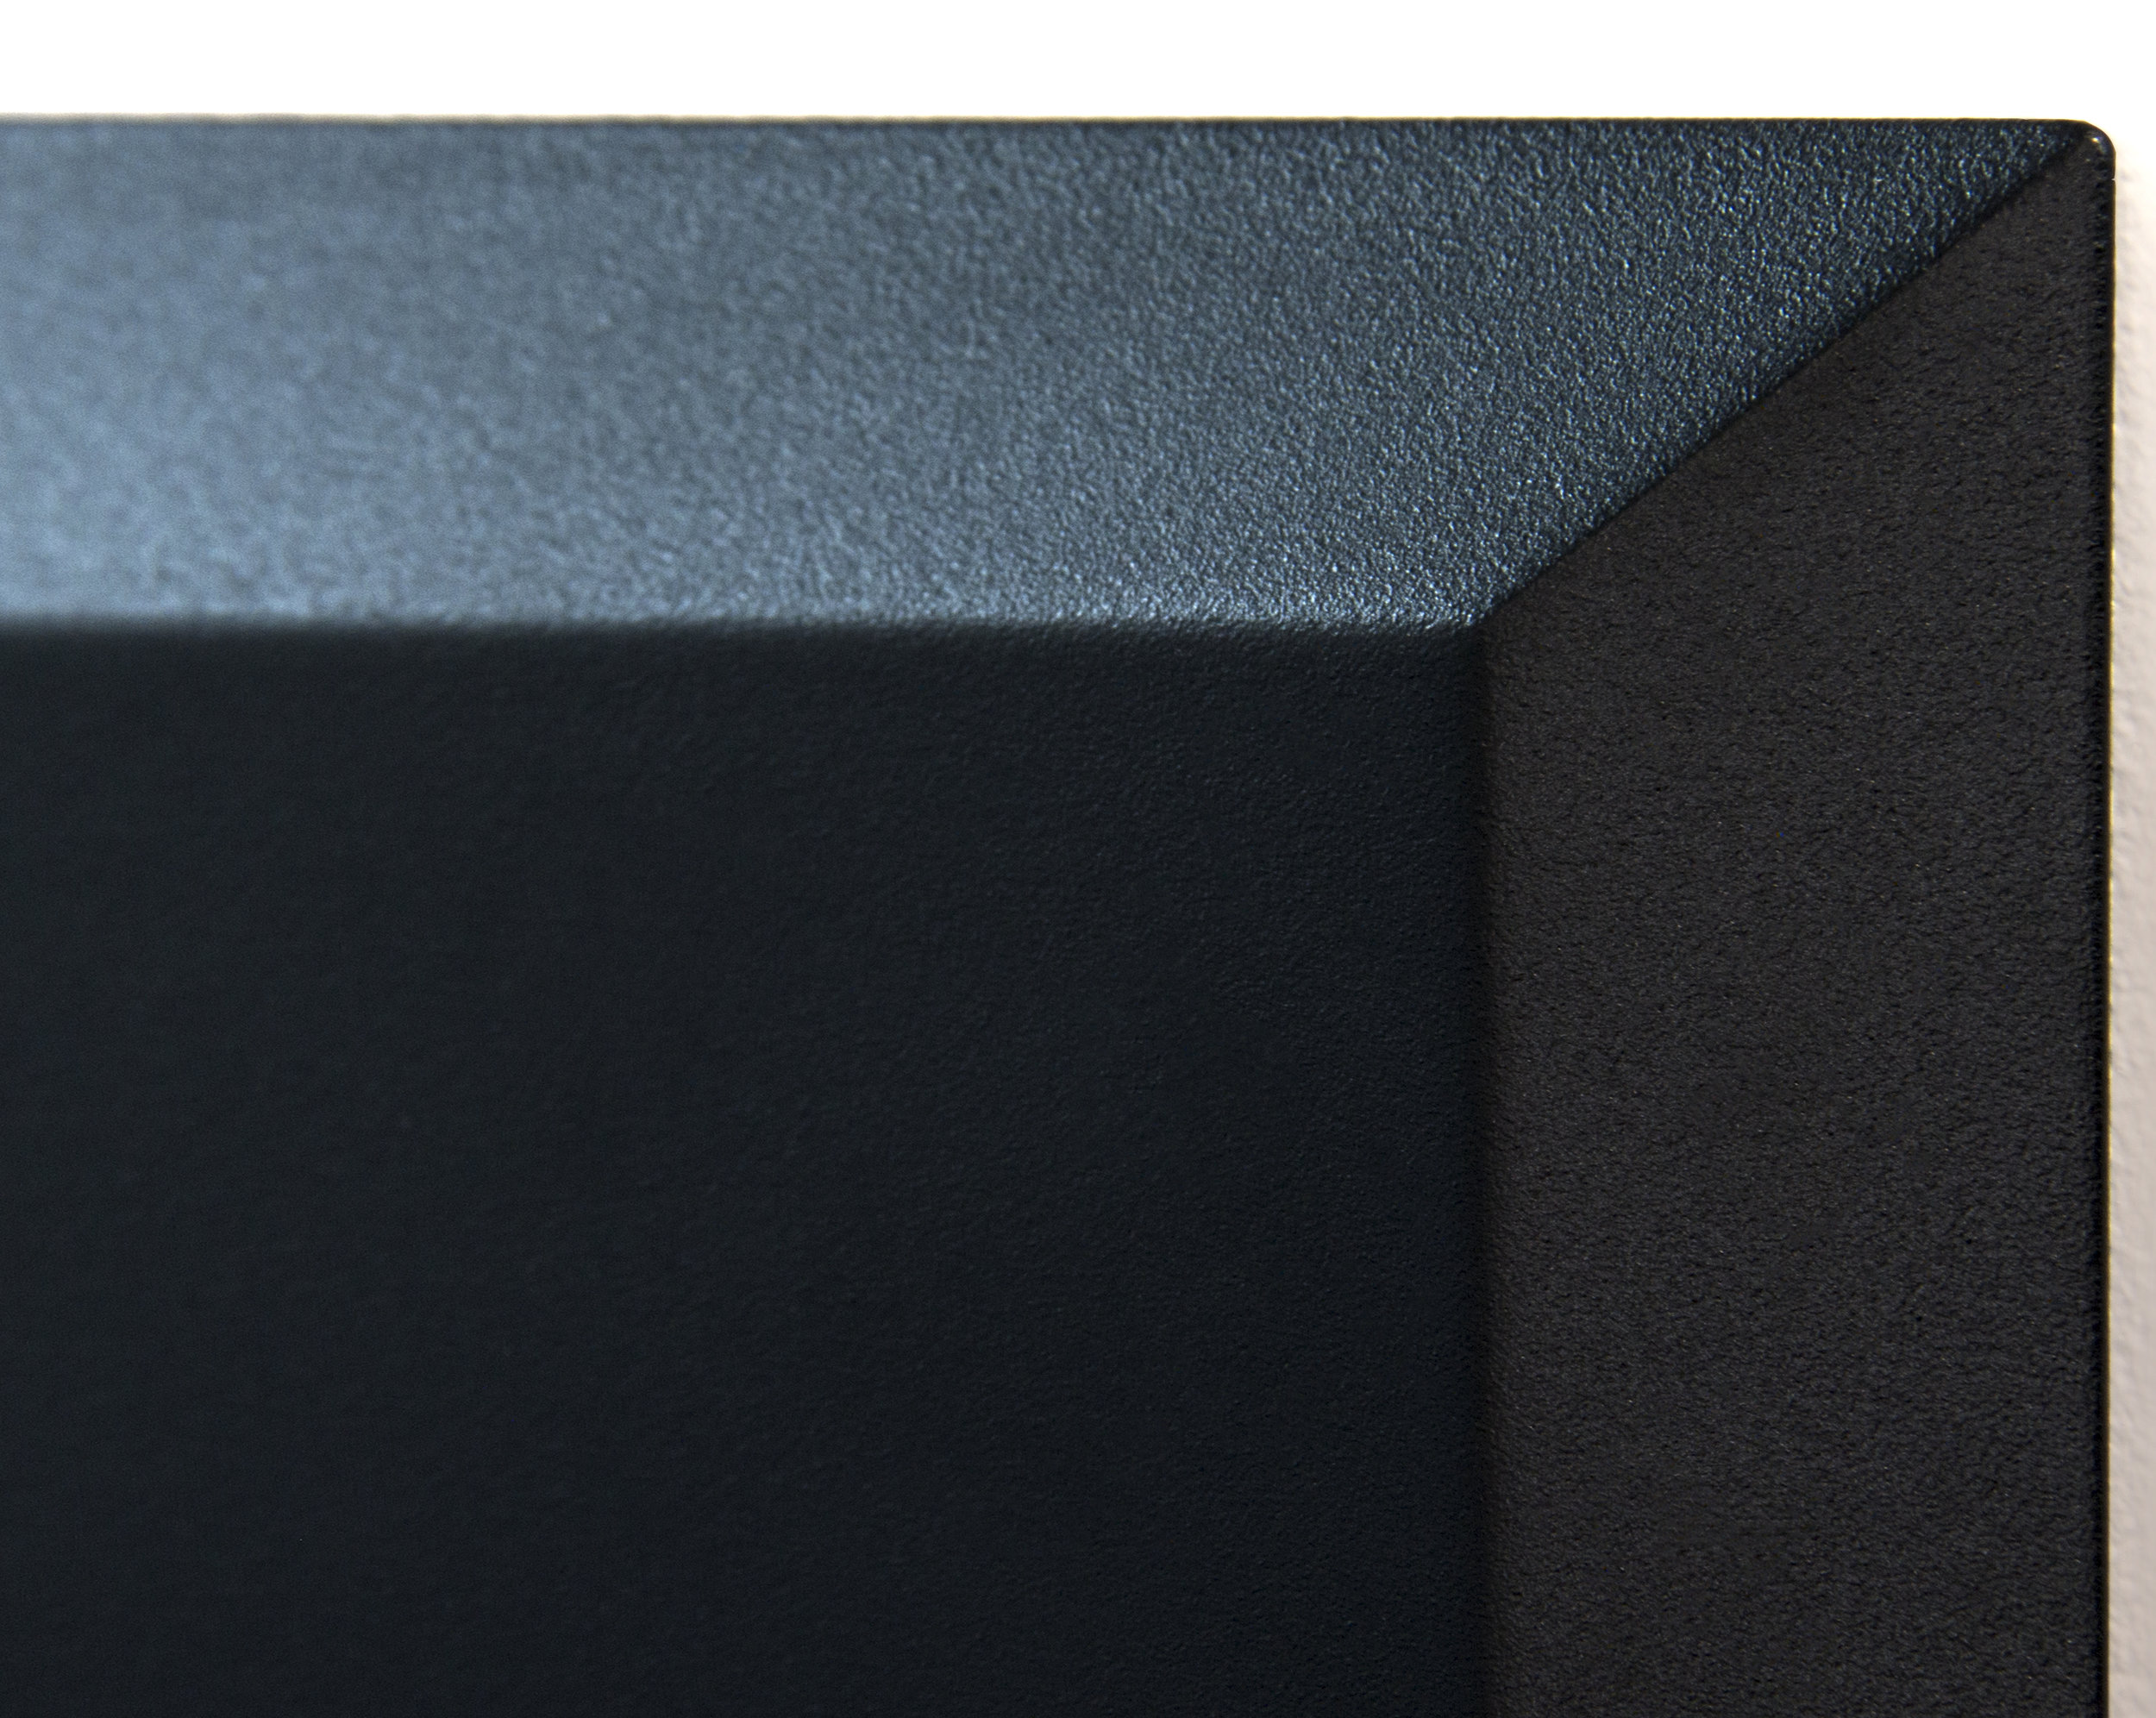 Close-up 4.jpg